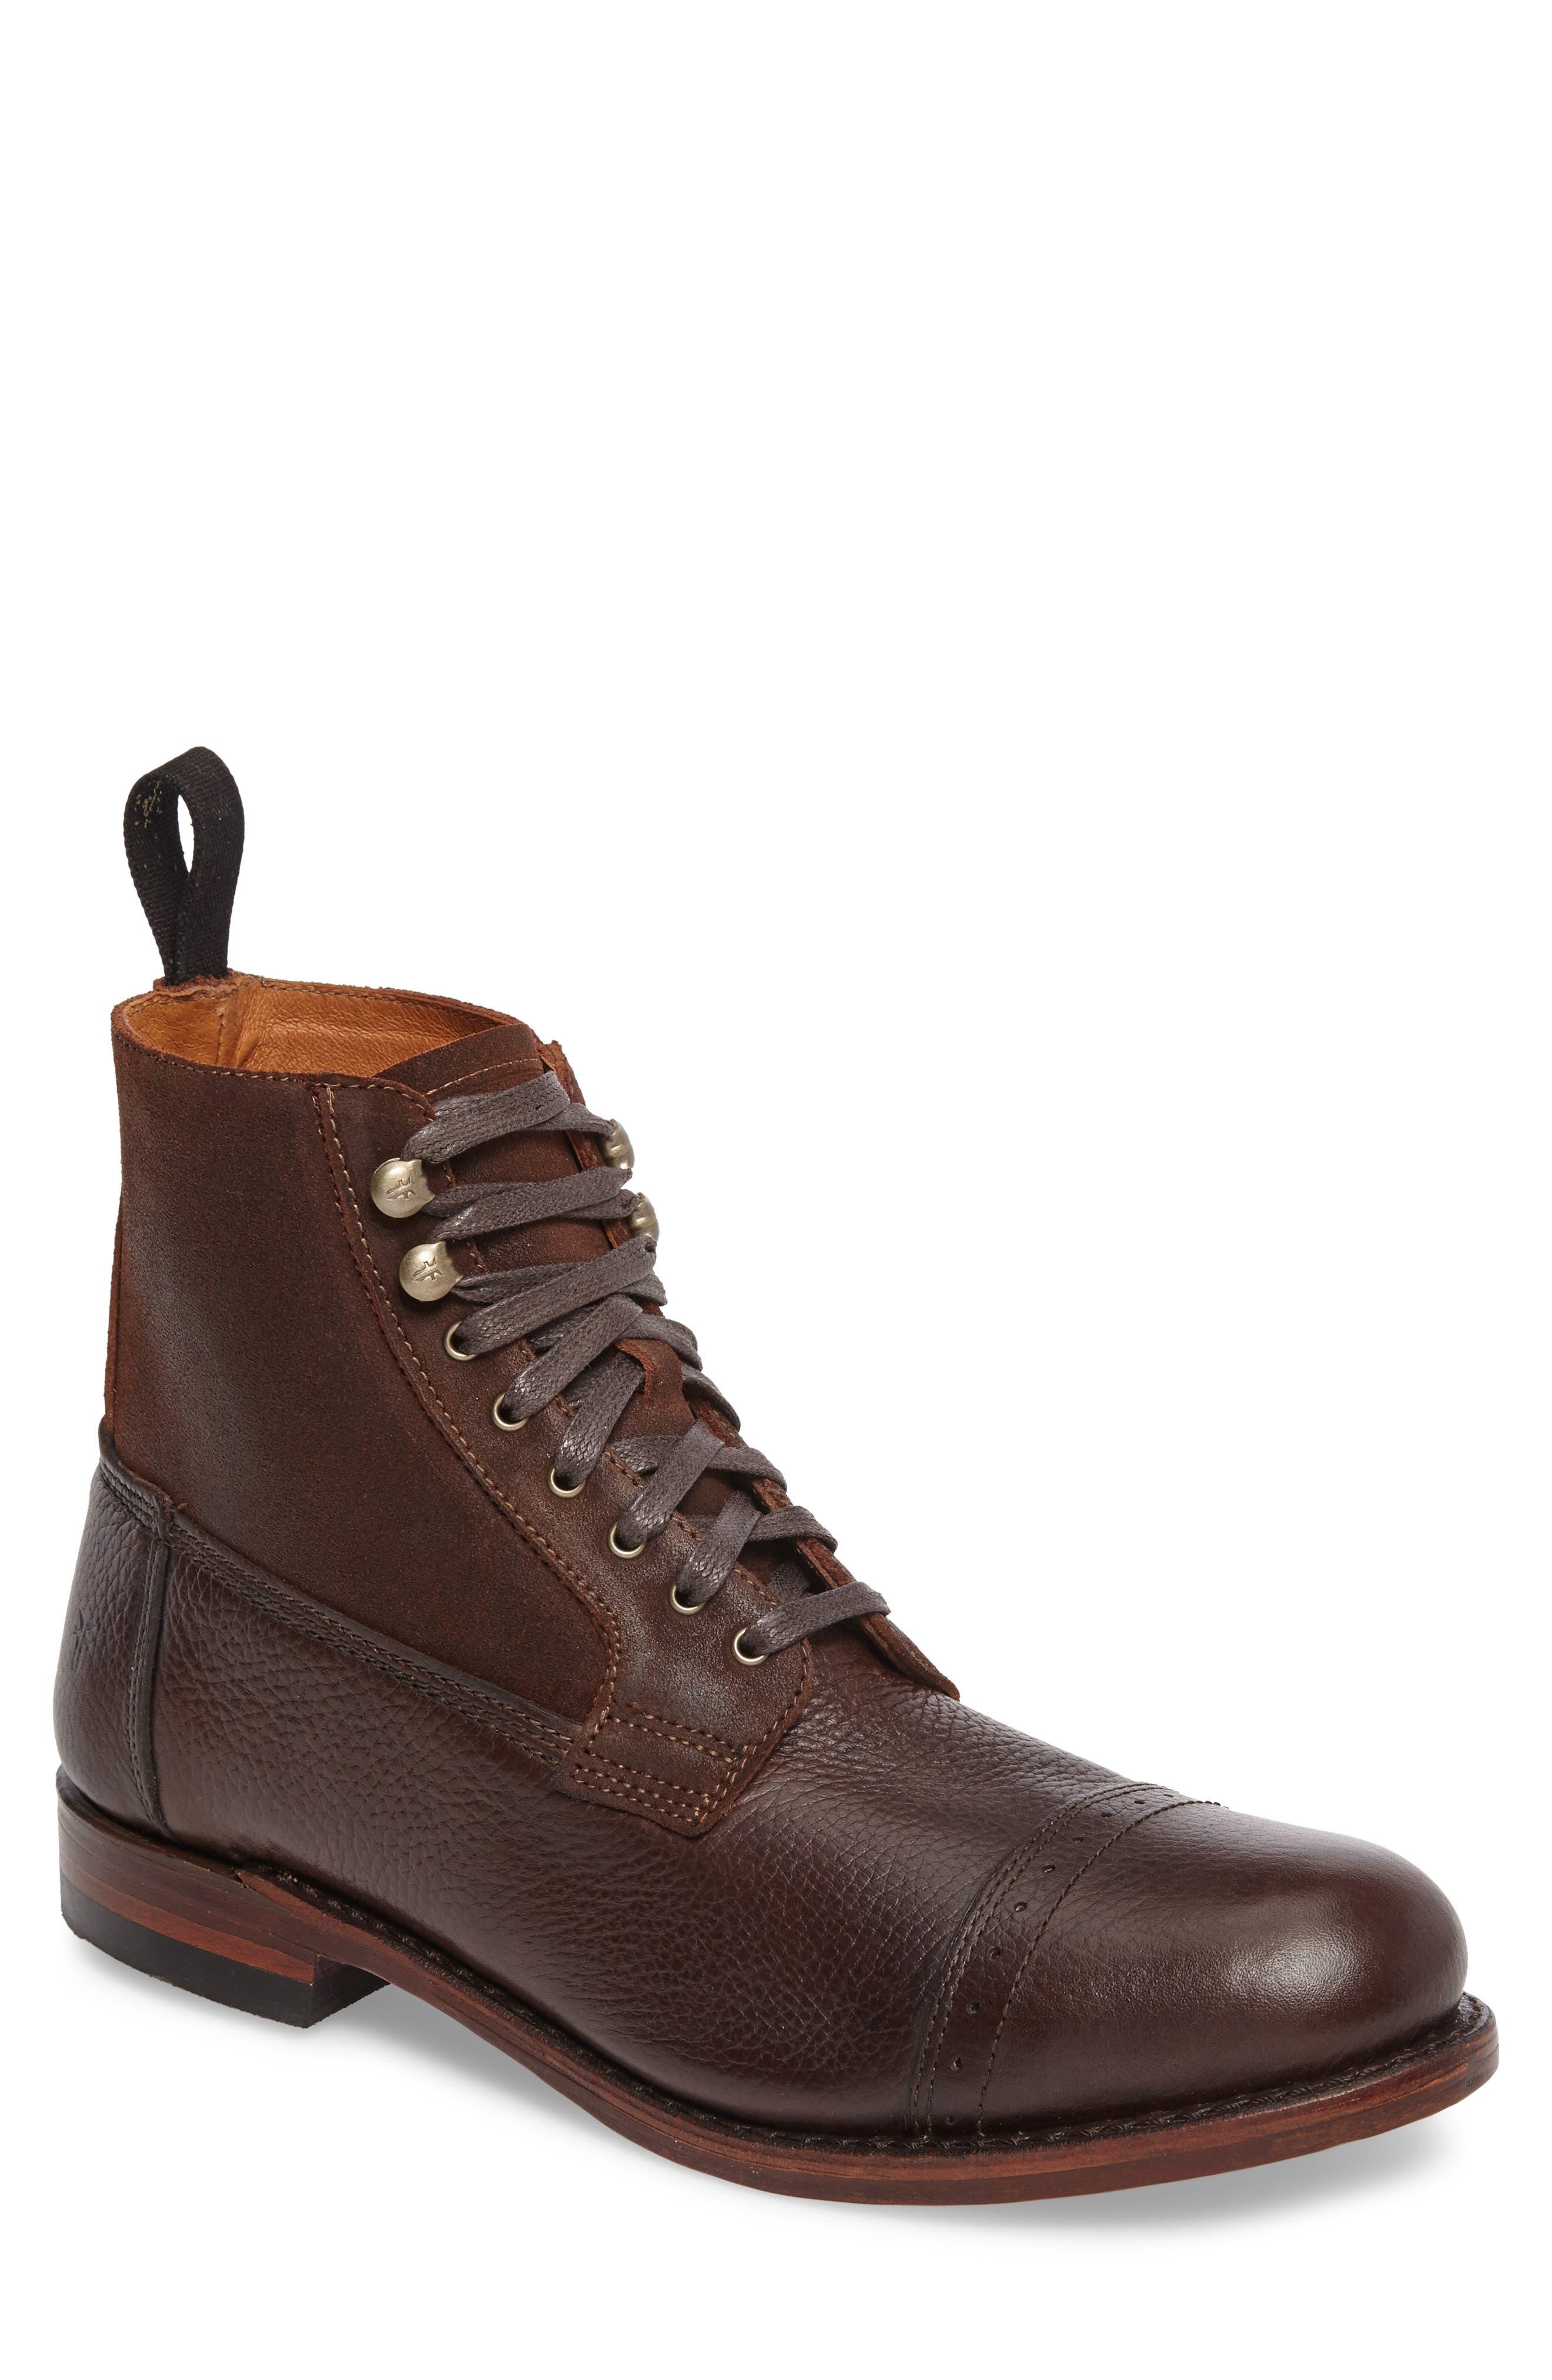 Frey Garrison Cap Toe Boot- Brown